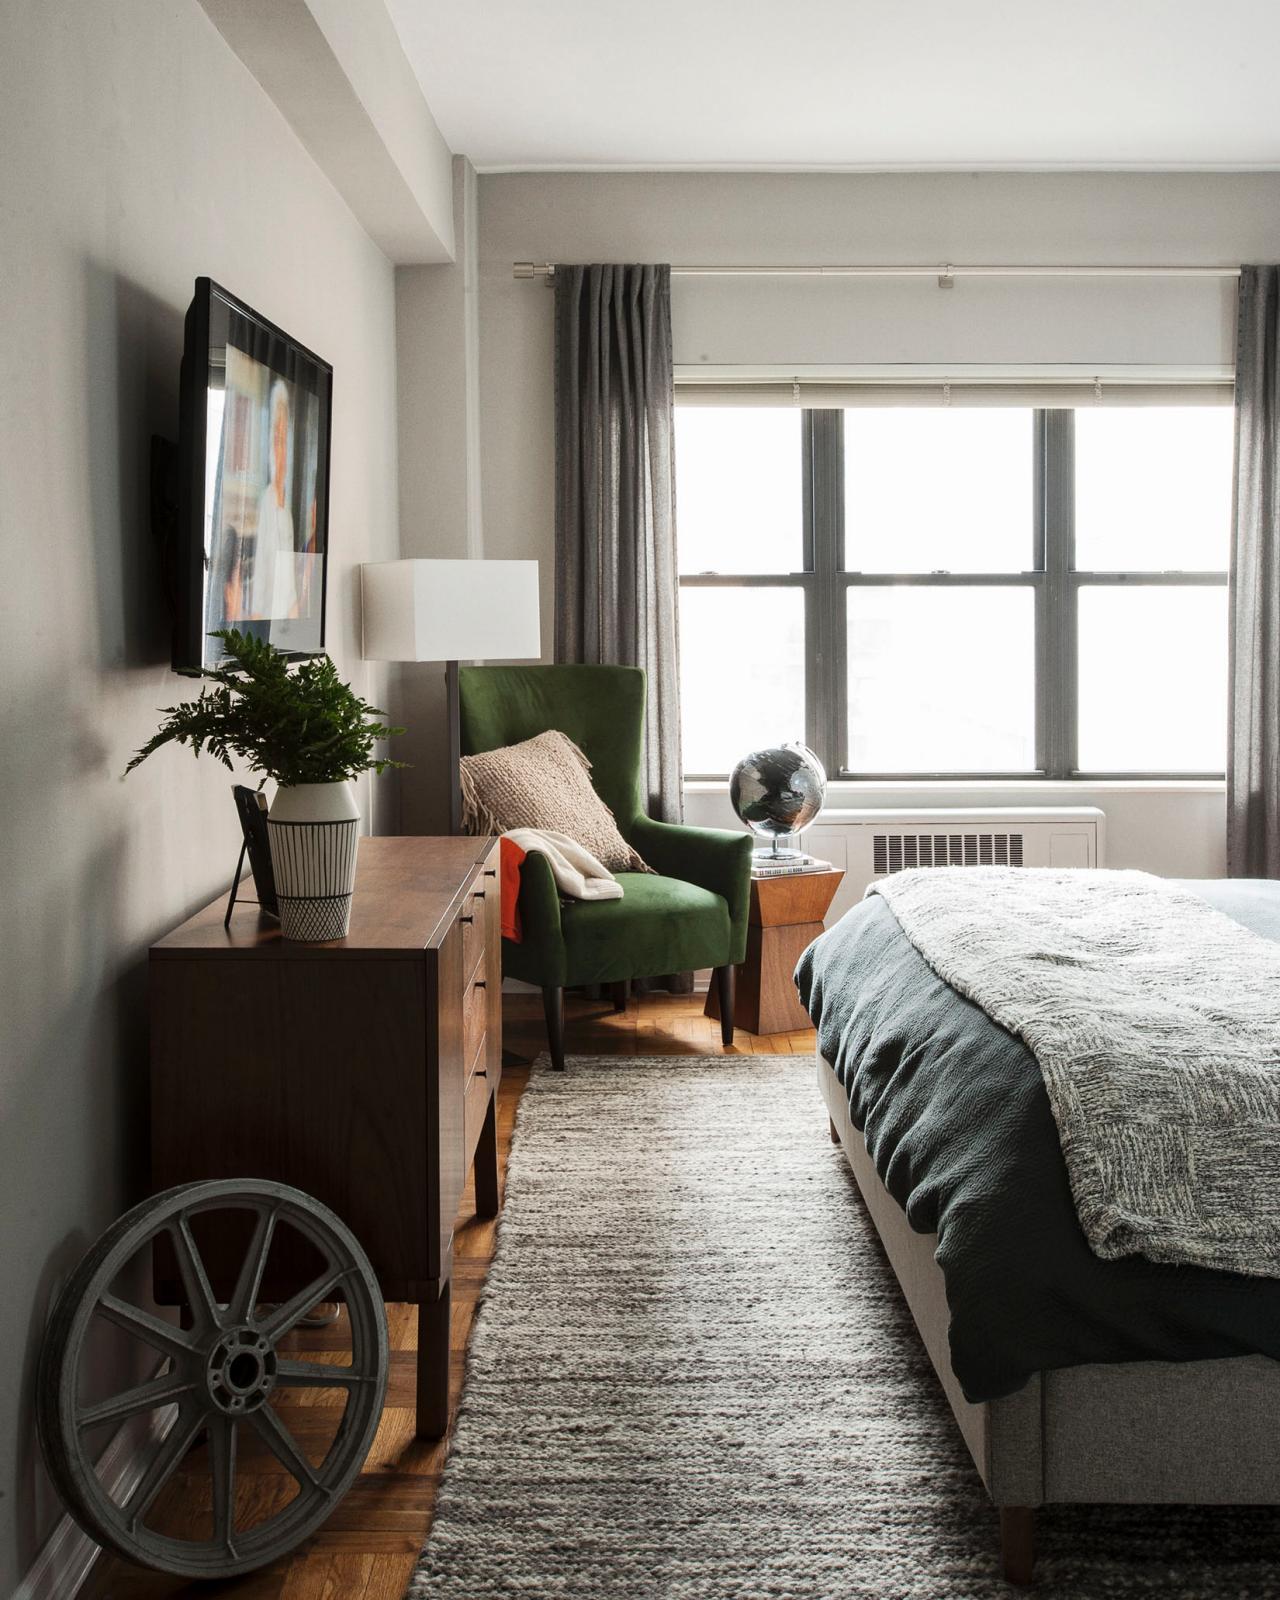 Bed sheet patterns men - Guys Here S Your Ultimate Bedding Cheat Sheet Hgtv S Decorating Design Blog Hgtv